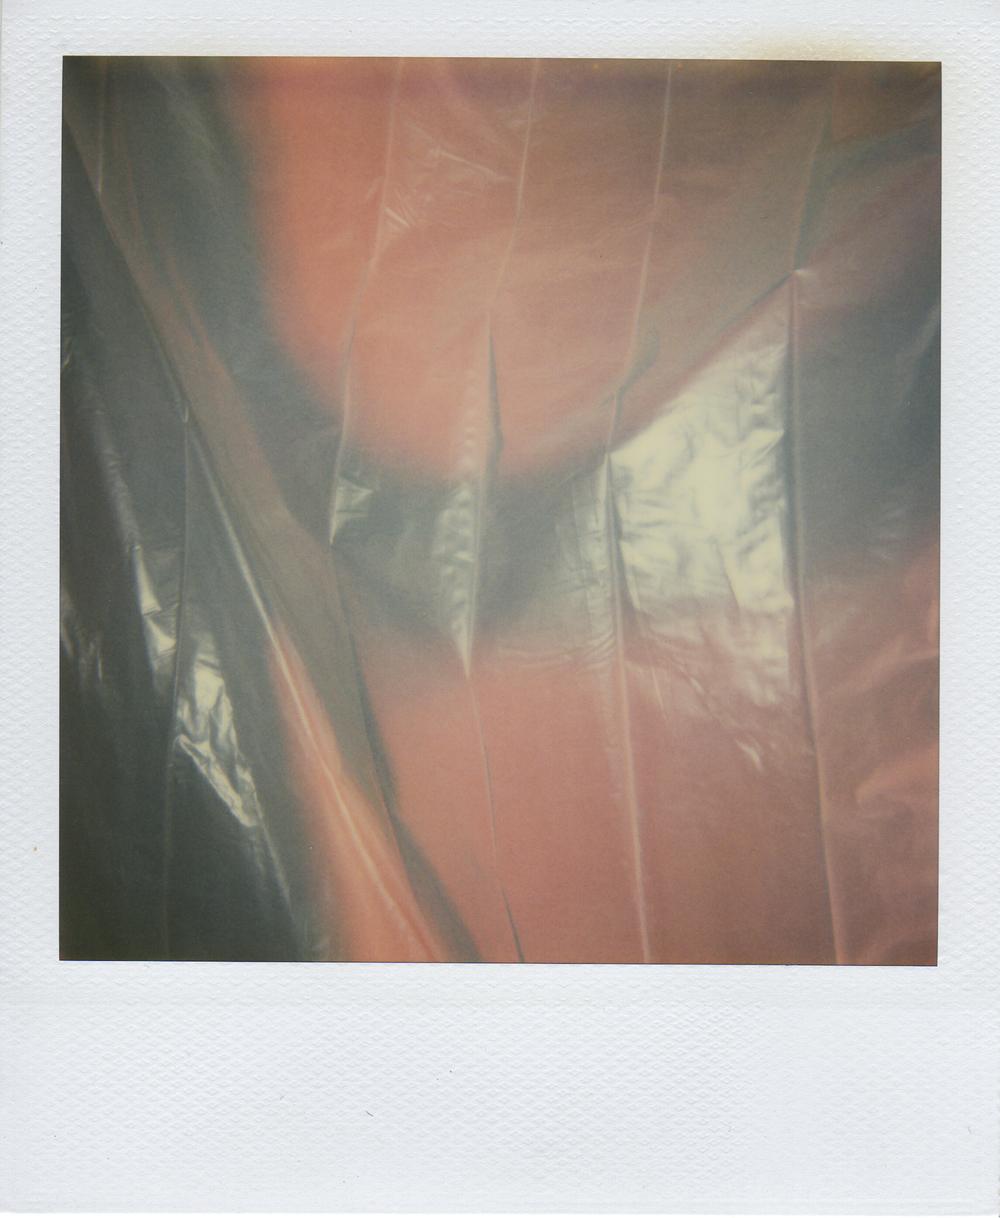 jlaurence-polaroid-149.jpg